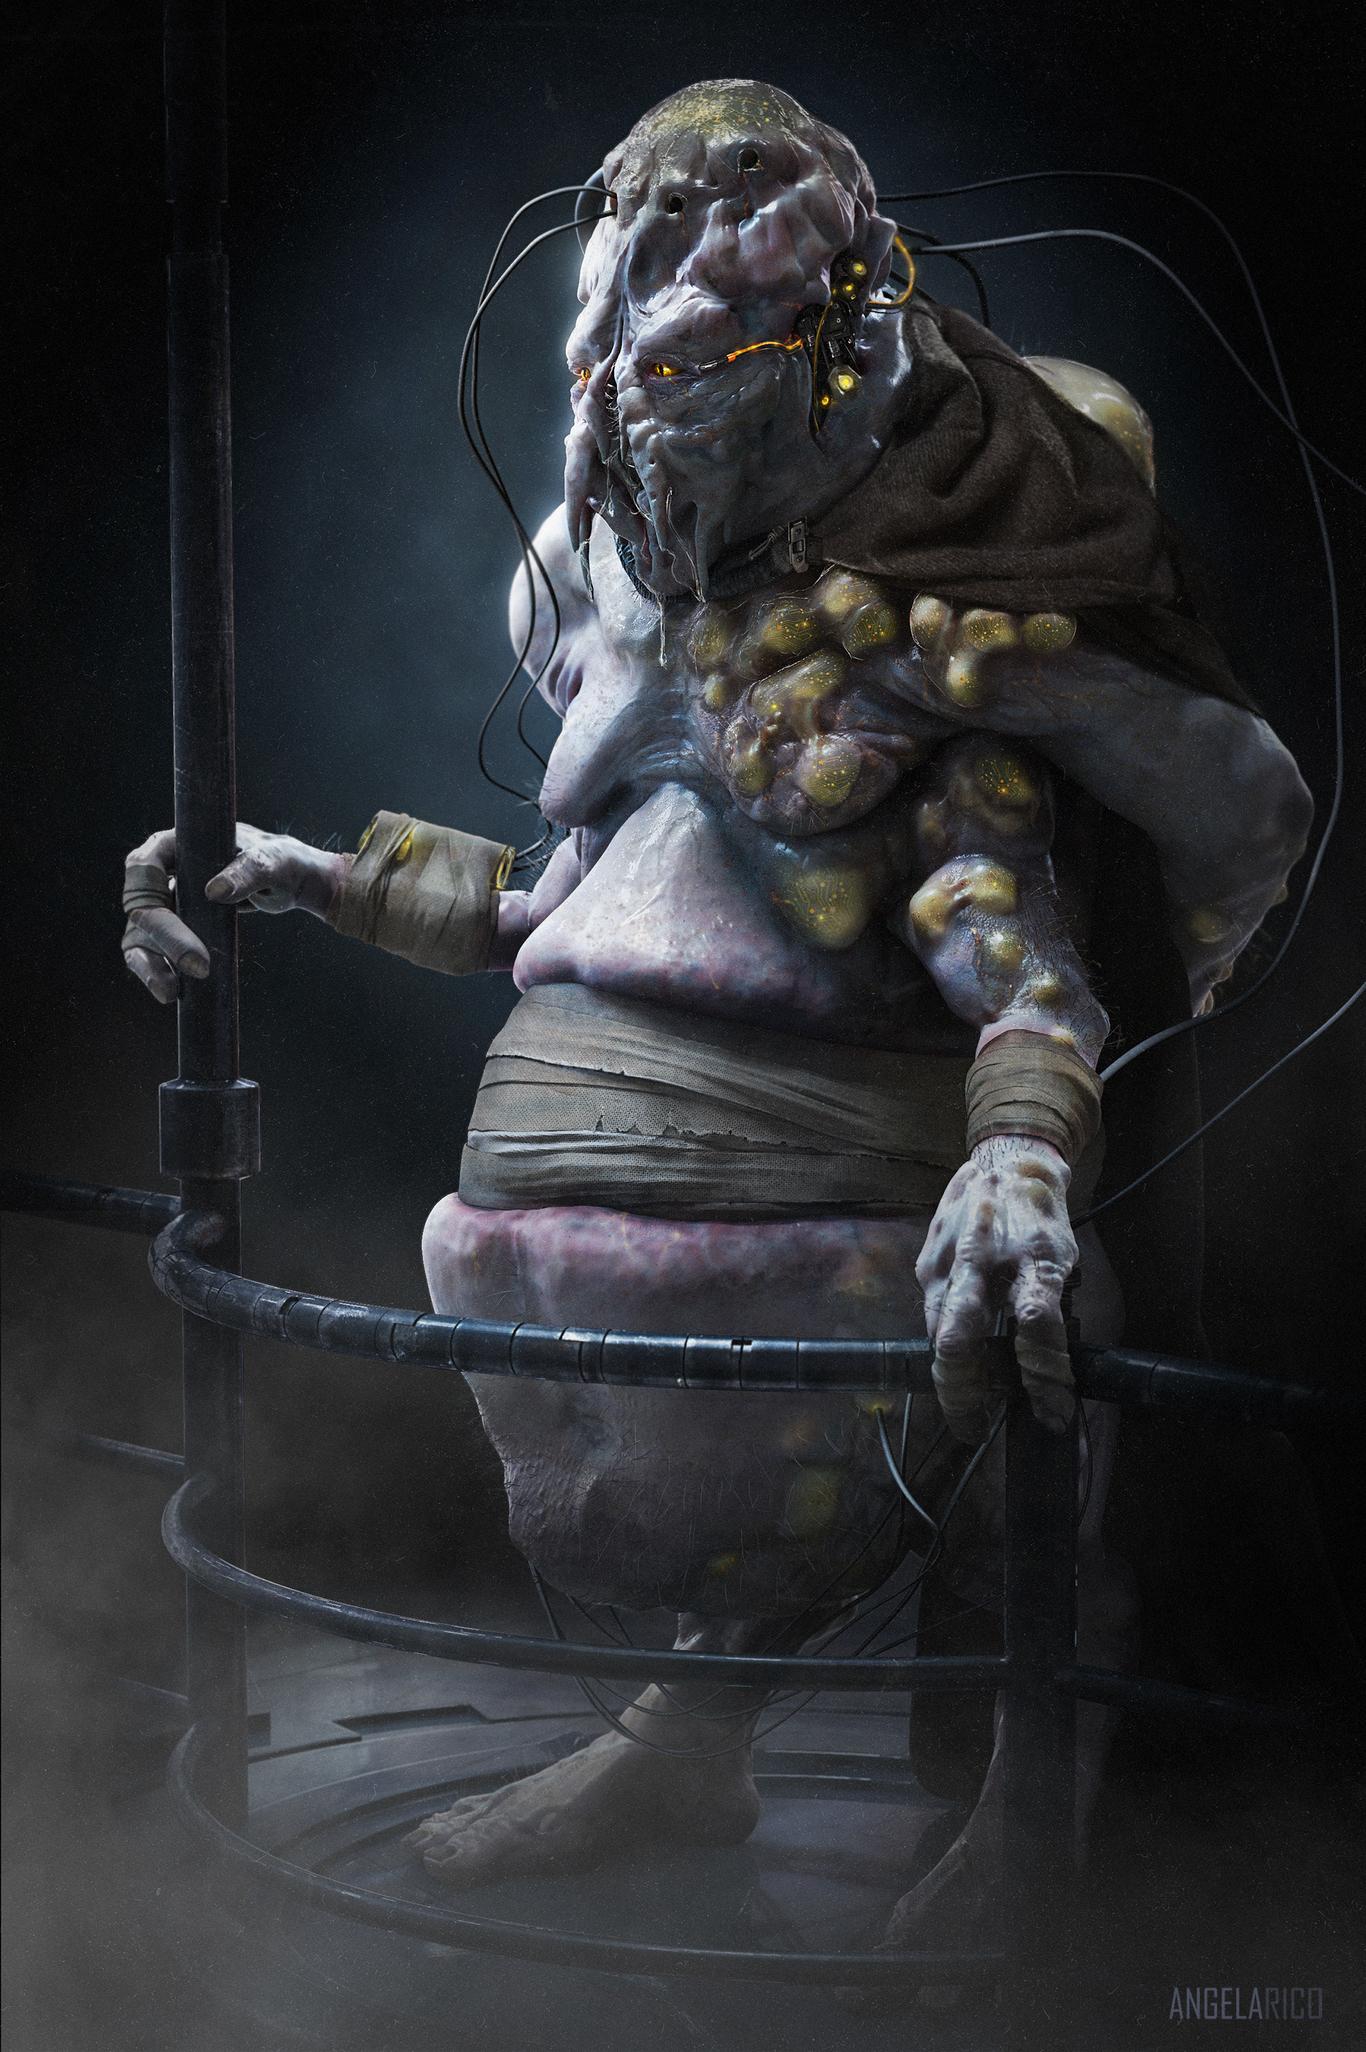 Angelarico corrupted creature 1 a38fd81b fyxm